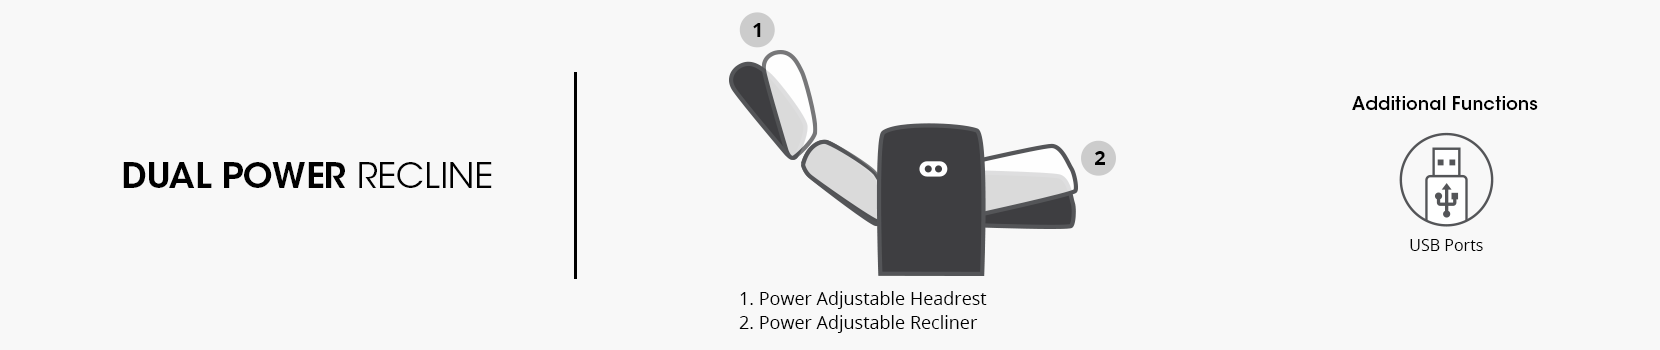 dual power recline. 1. power adjustable headrest. 2. power adjustable recliner. additional functions. USB ports.